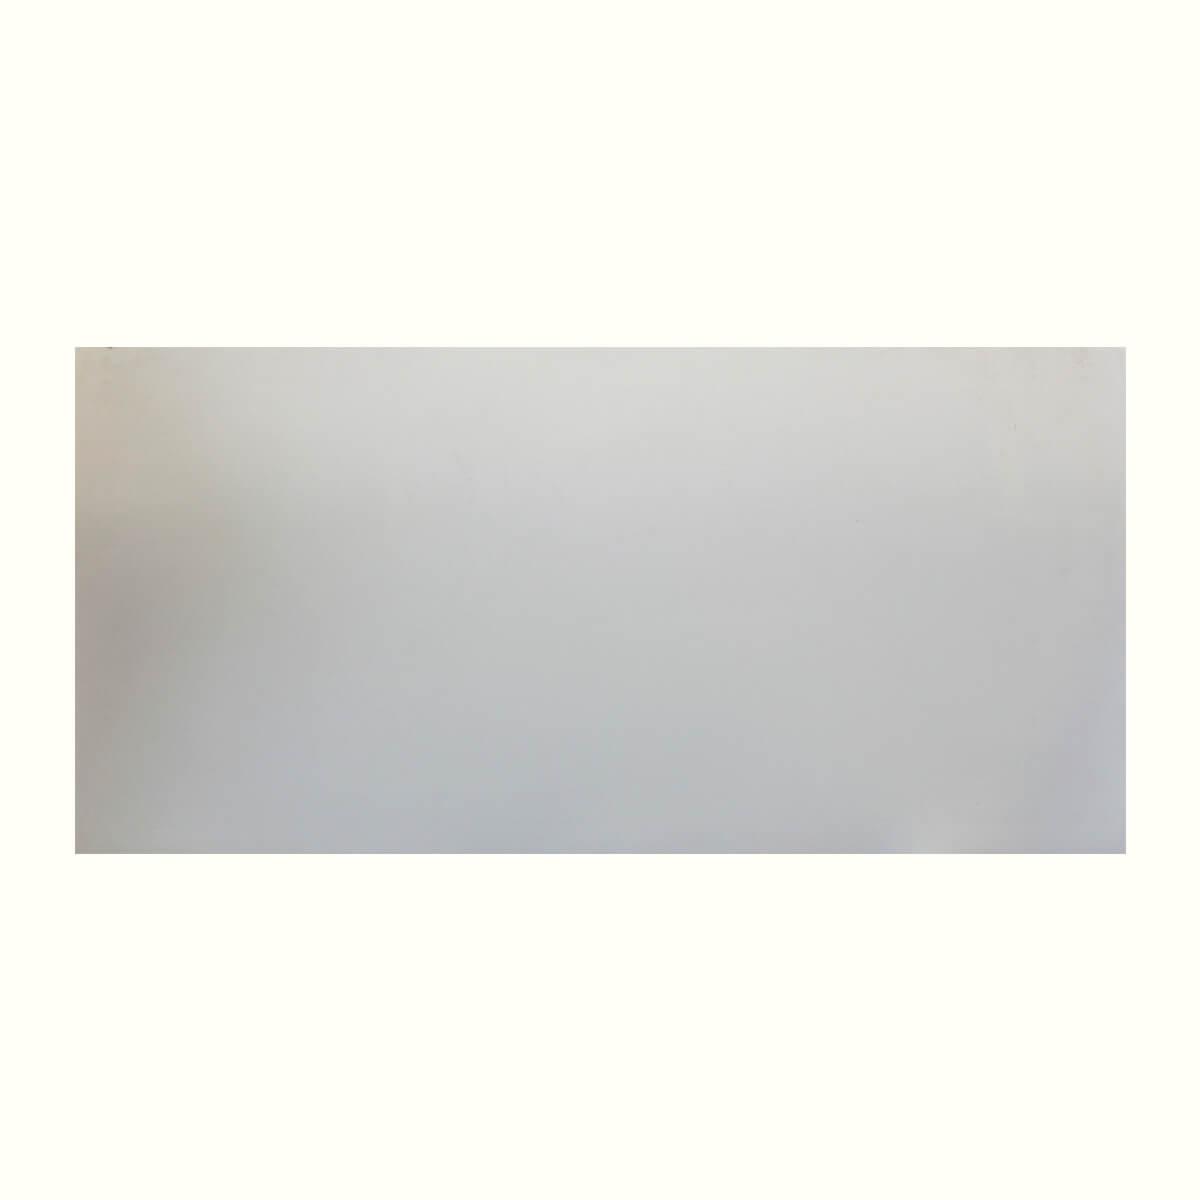 "Puck Board  - 4' x 8' - 1/4"" sheet"